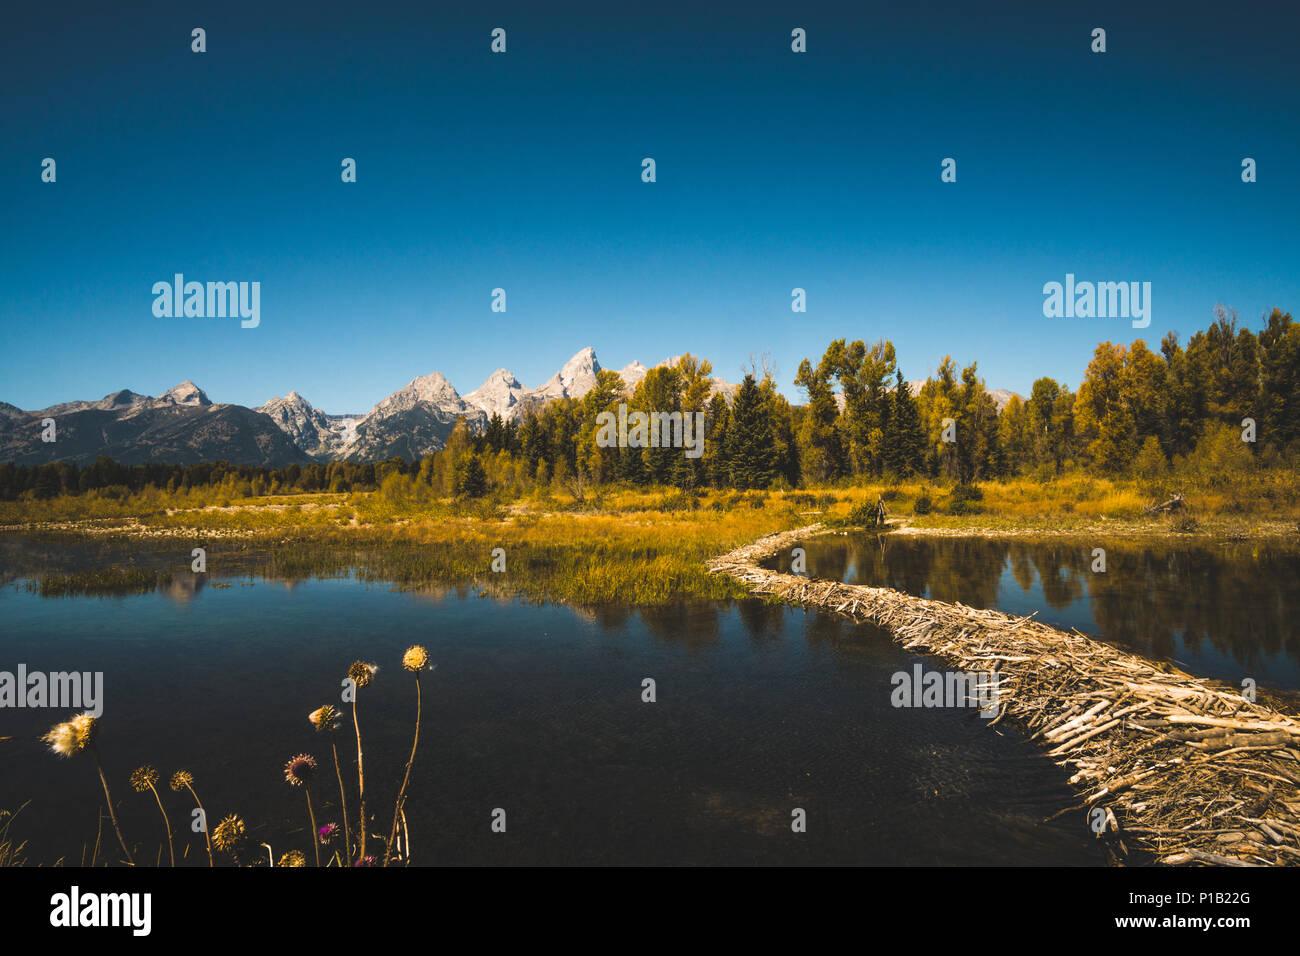 Teton Dam Stock Photos & Teton Dam Stock Images - Alamy